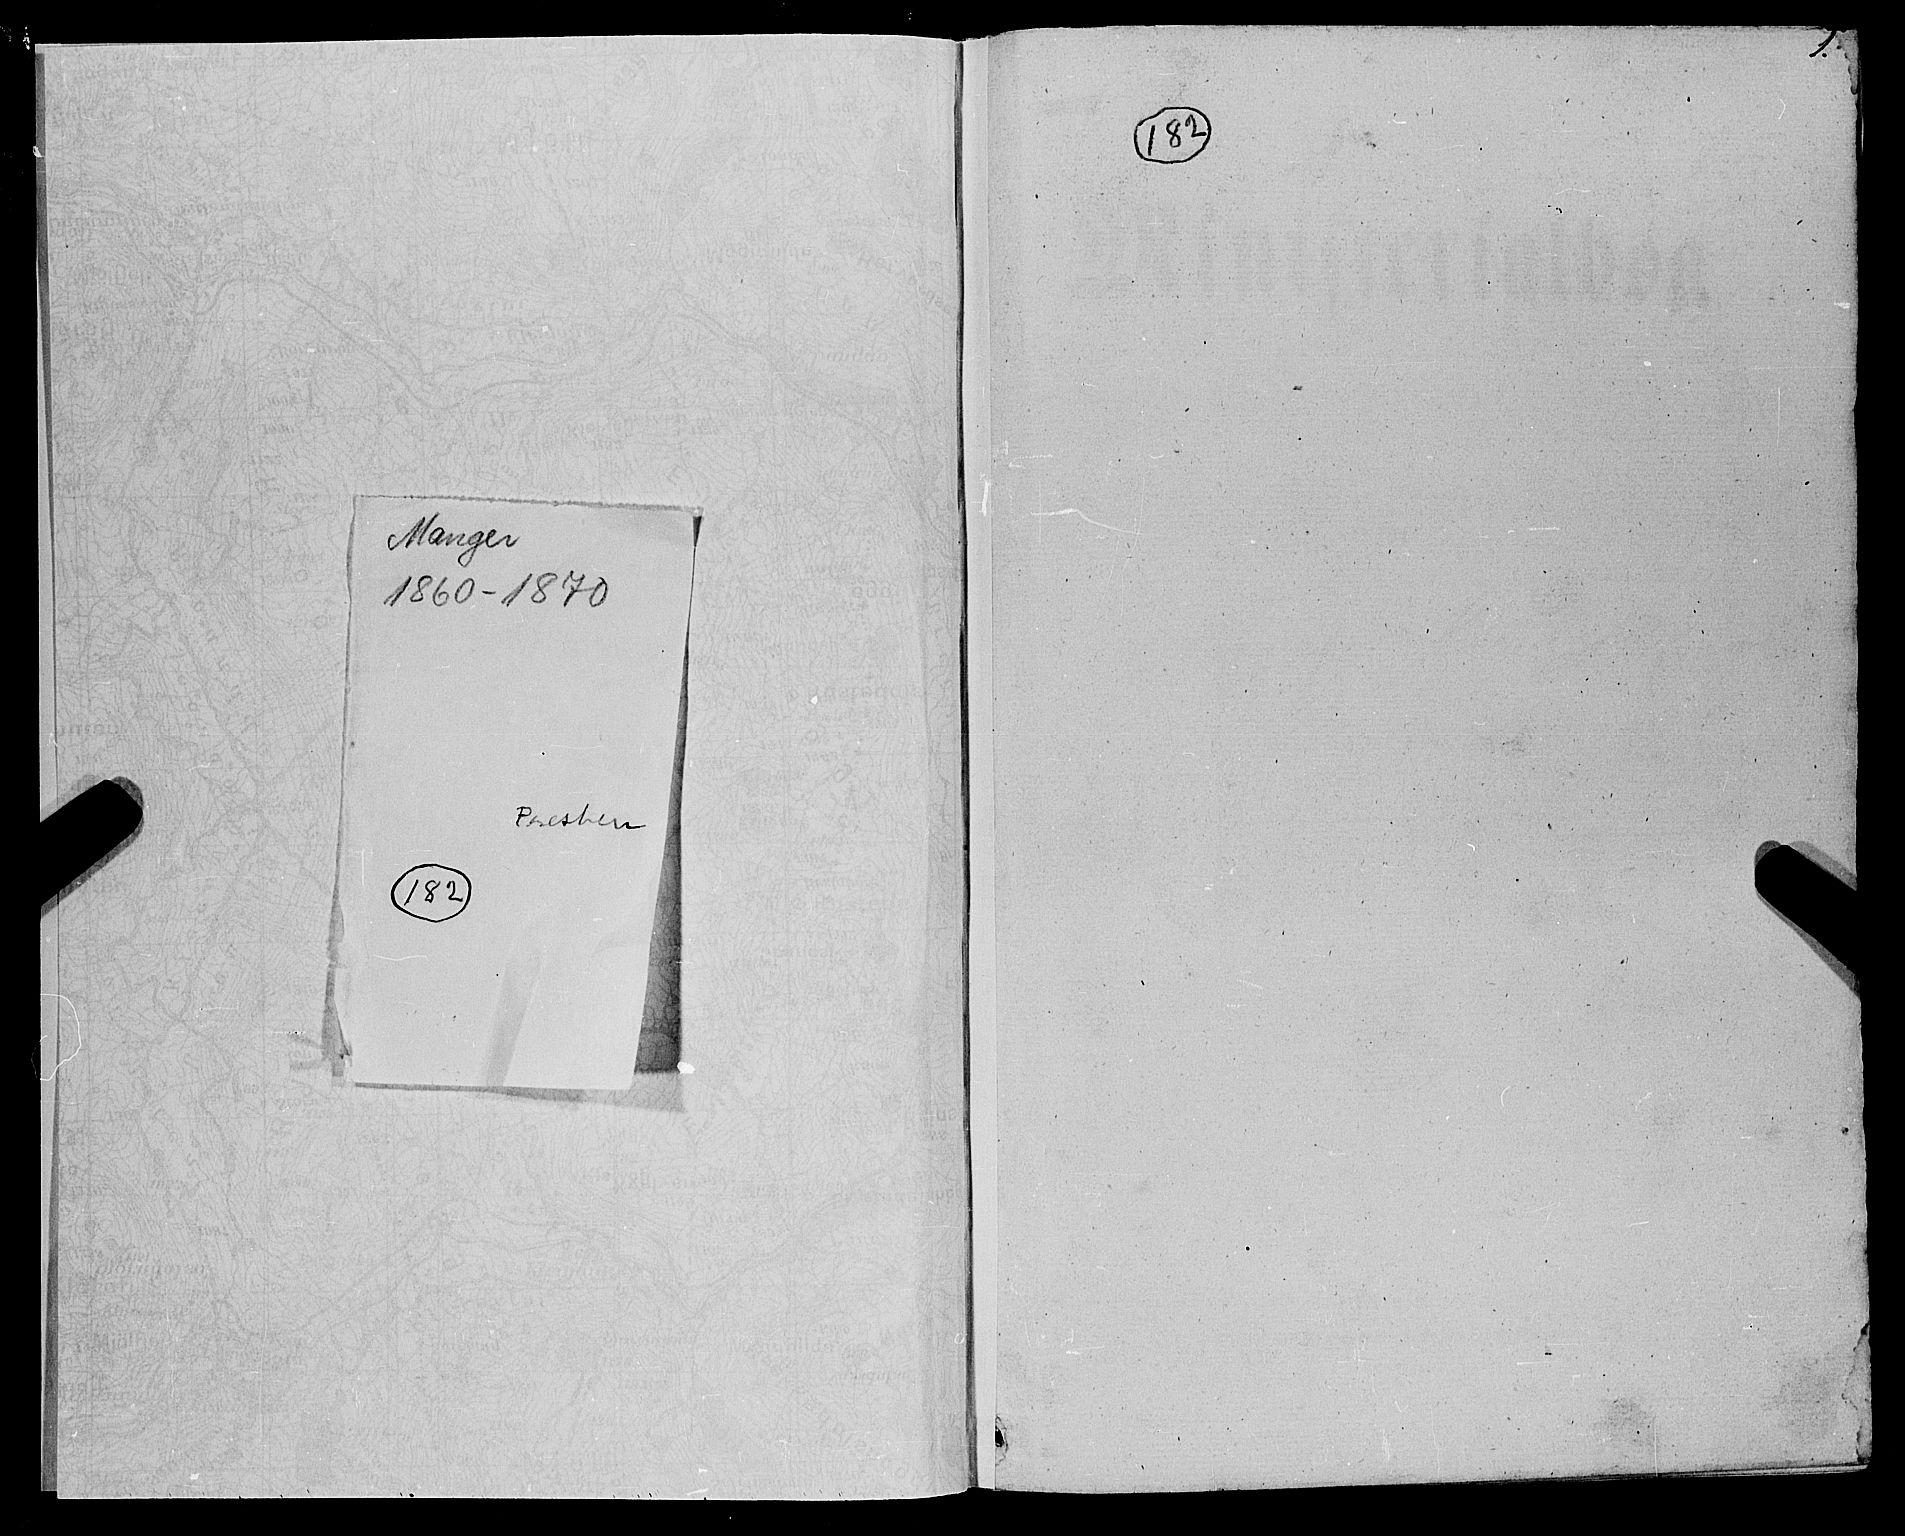 SAB, Manger sokneprestembete, H/Haa: Ministerialbok nr. A 7, 1860-1870